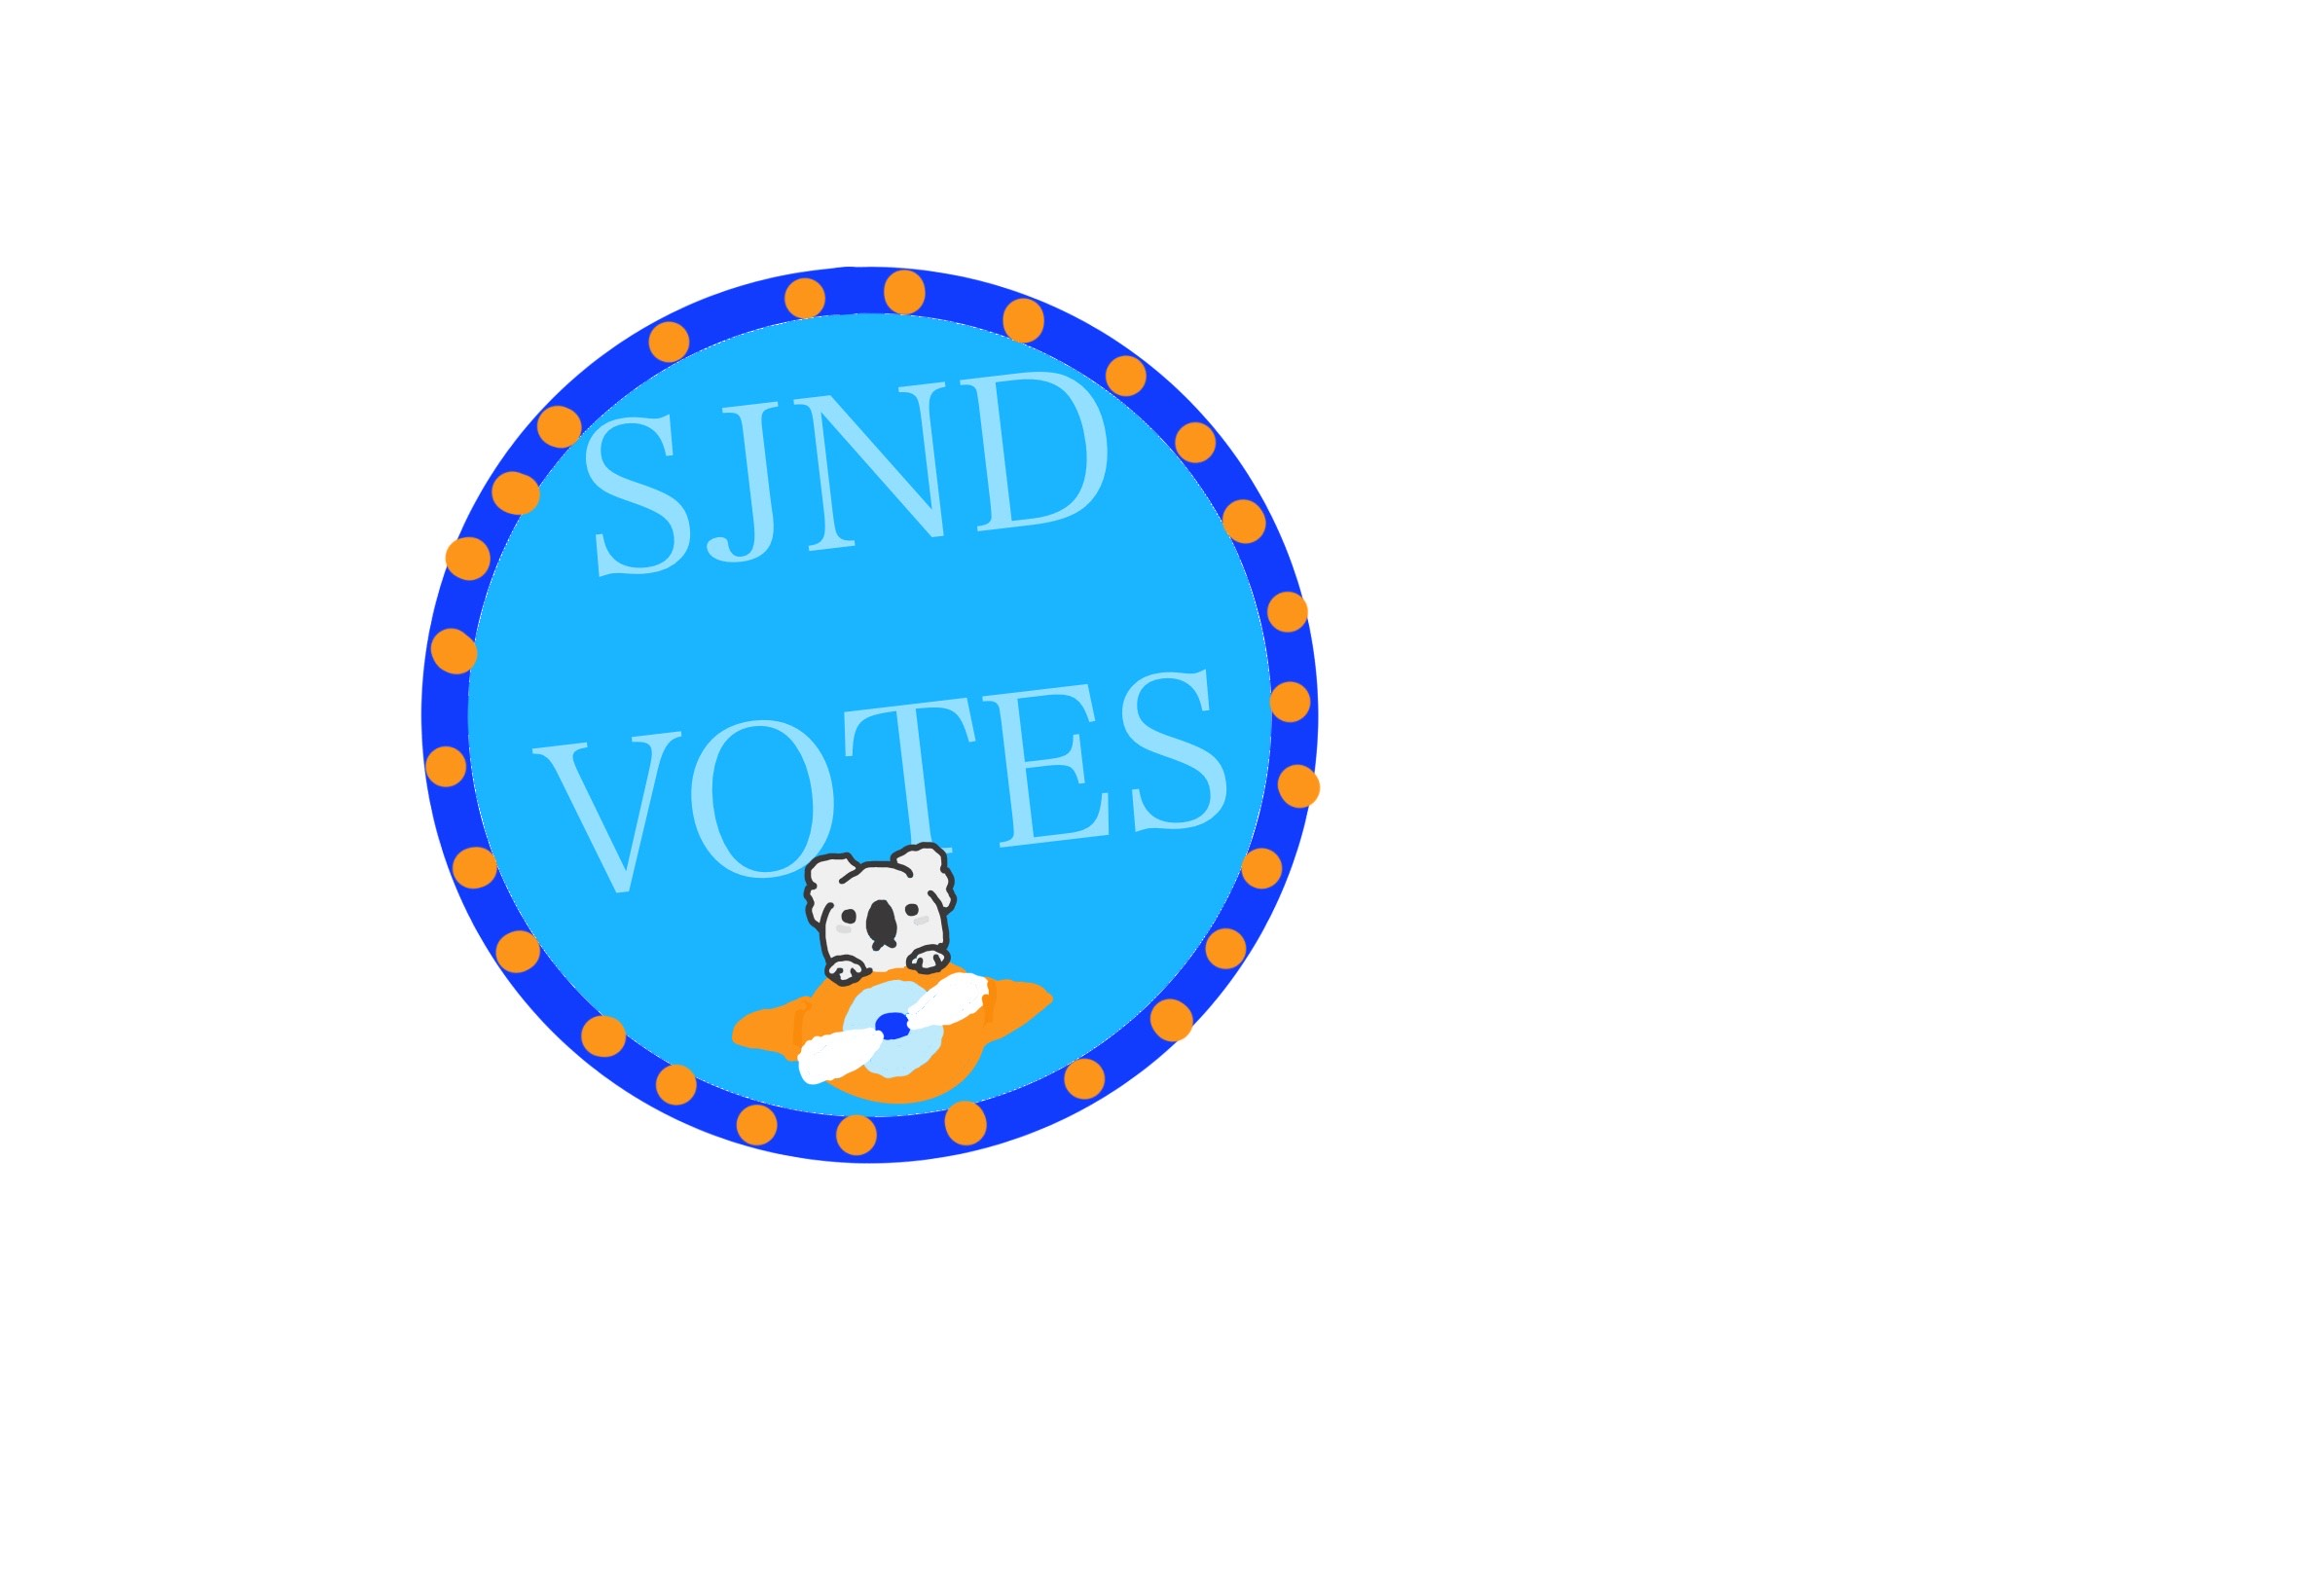 Get Civic: Encouraging Their Peers to Vote